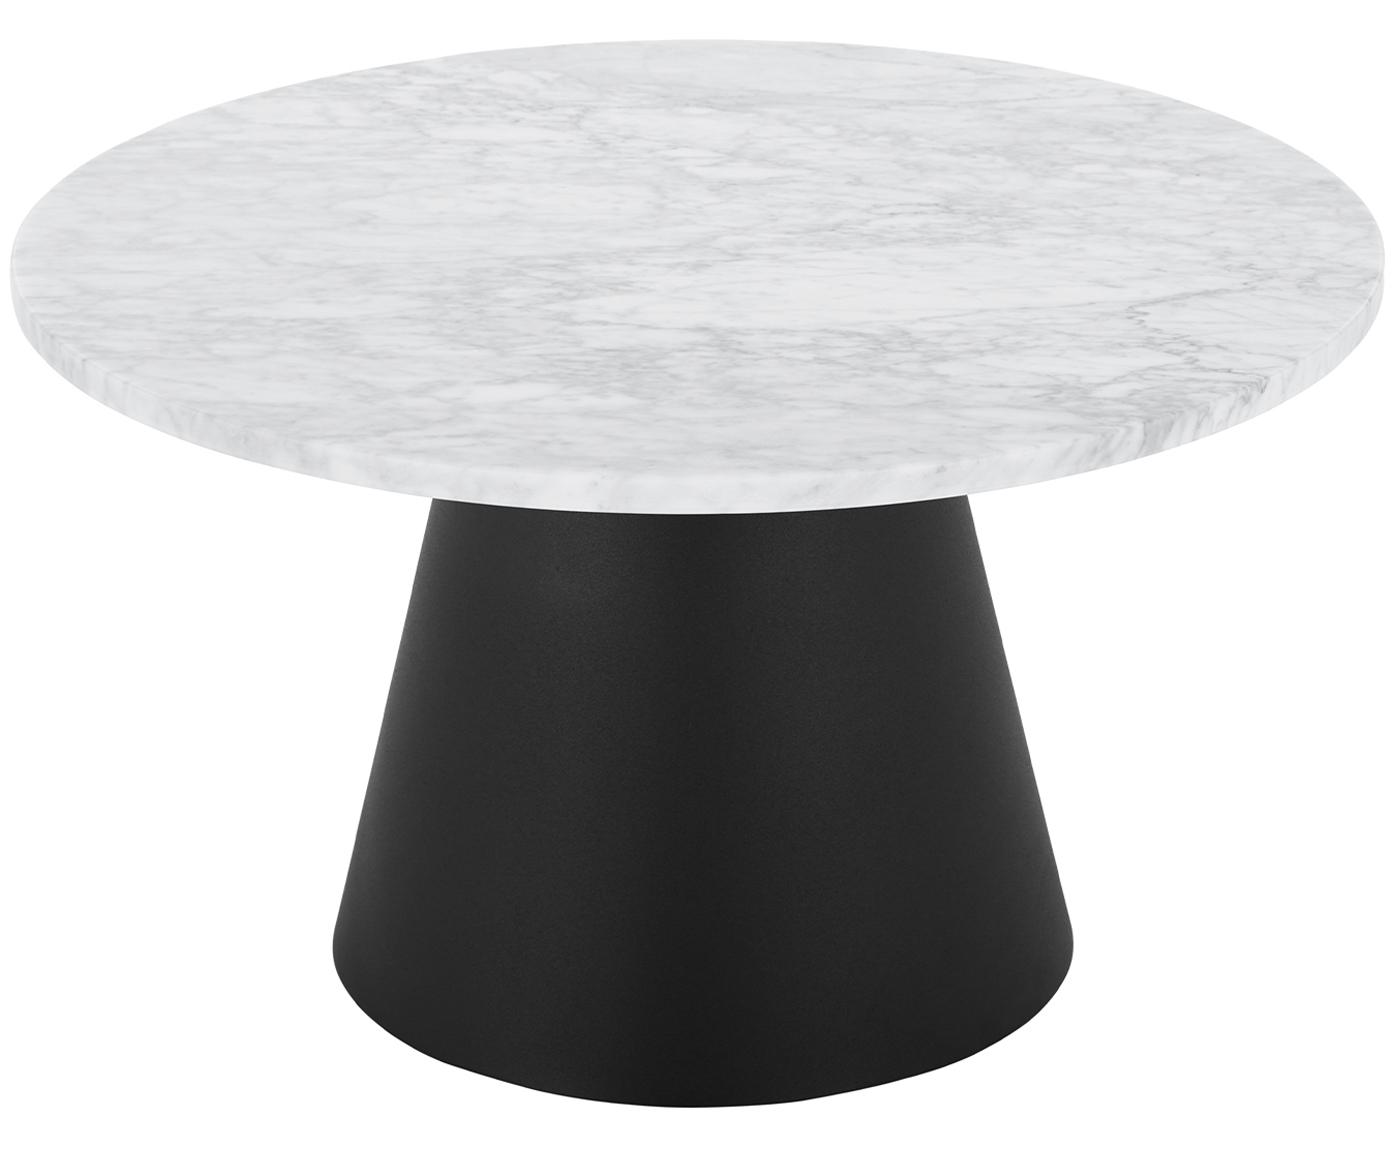 Runder Marmor-Couchtisch Mary, Tischplatte: Carrara-Marmor, Gestell: Metall, beschichtet, Weiss-grauer Marmor, Schwarz, ∅ 70 x H 40 cm